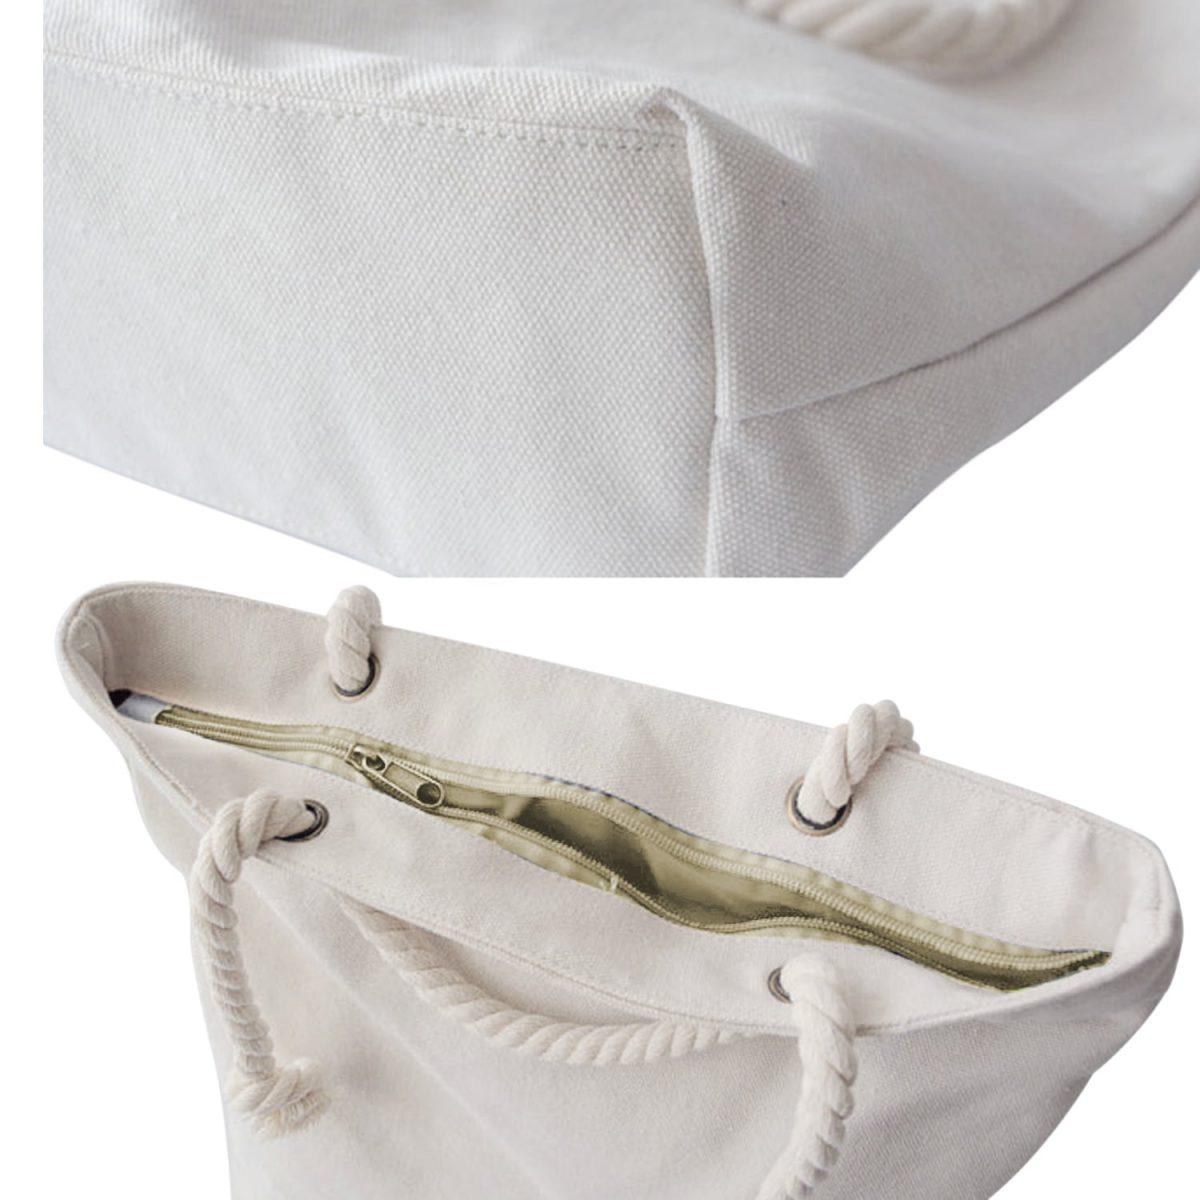 Lila Ekose Desenli Fermuarlı Modern Kumaş Çanta Realhomes